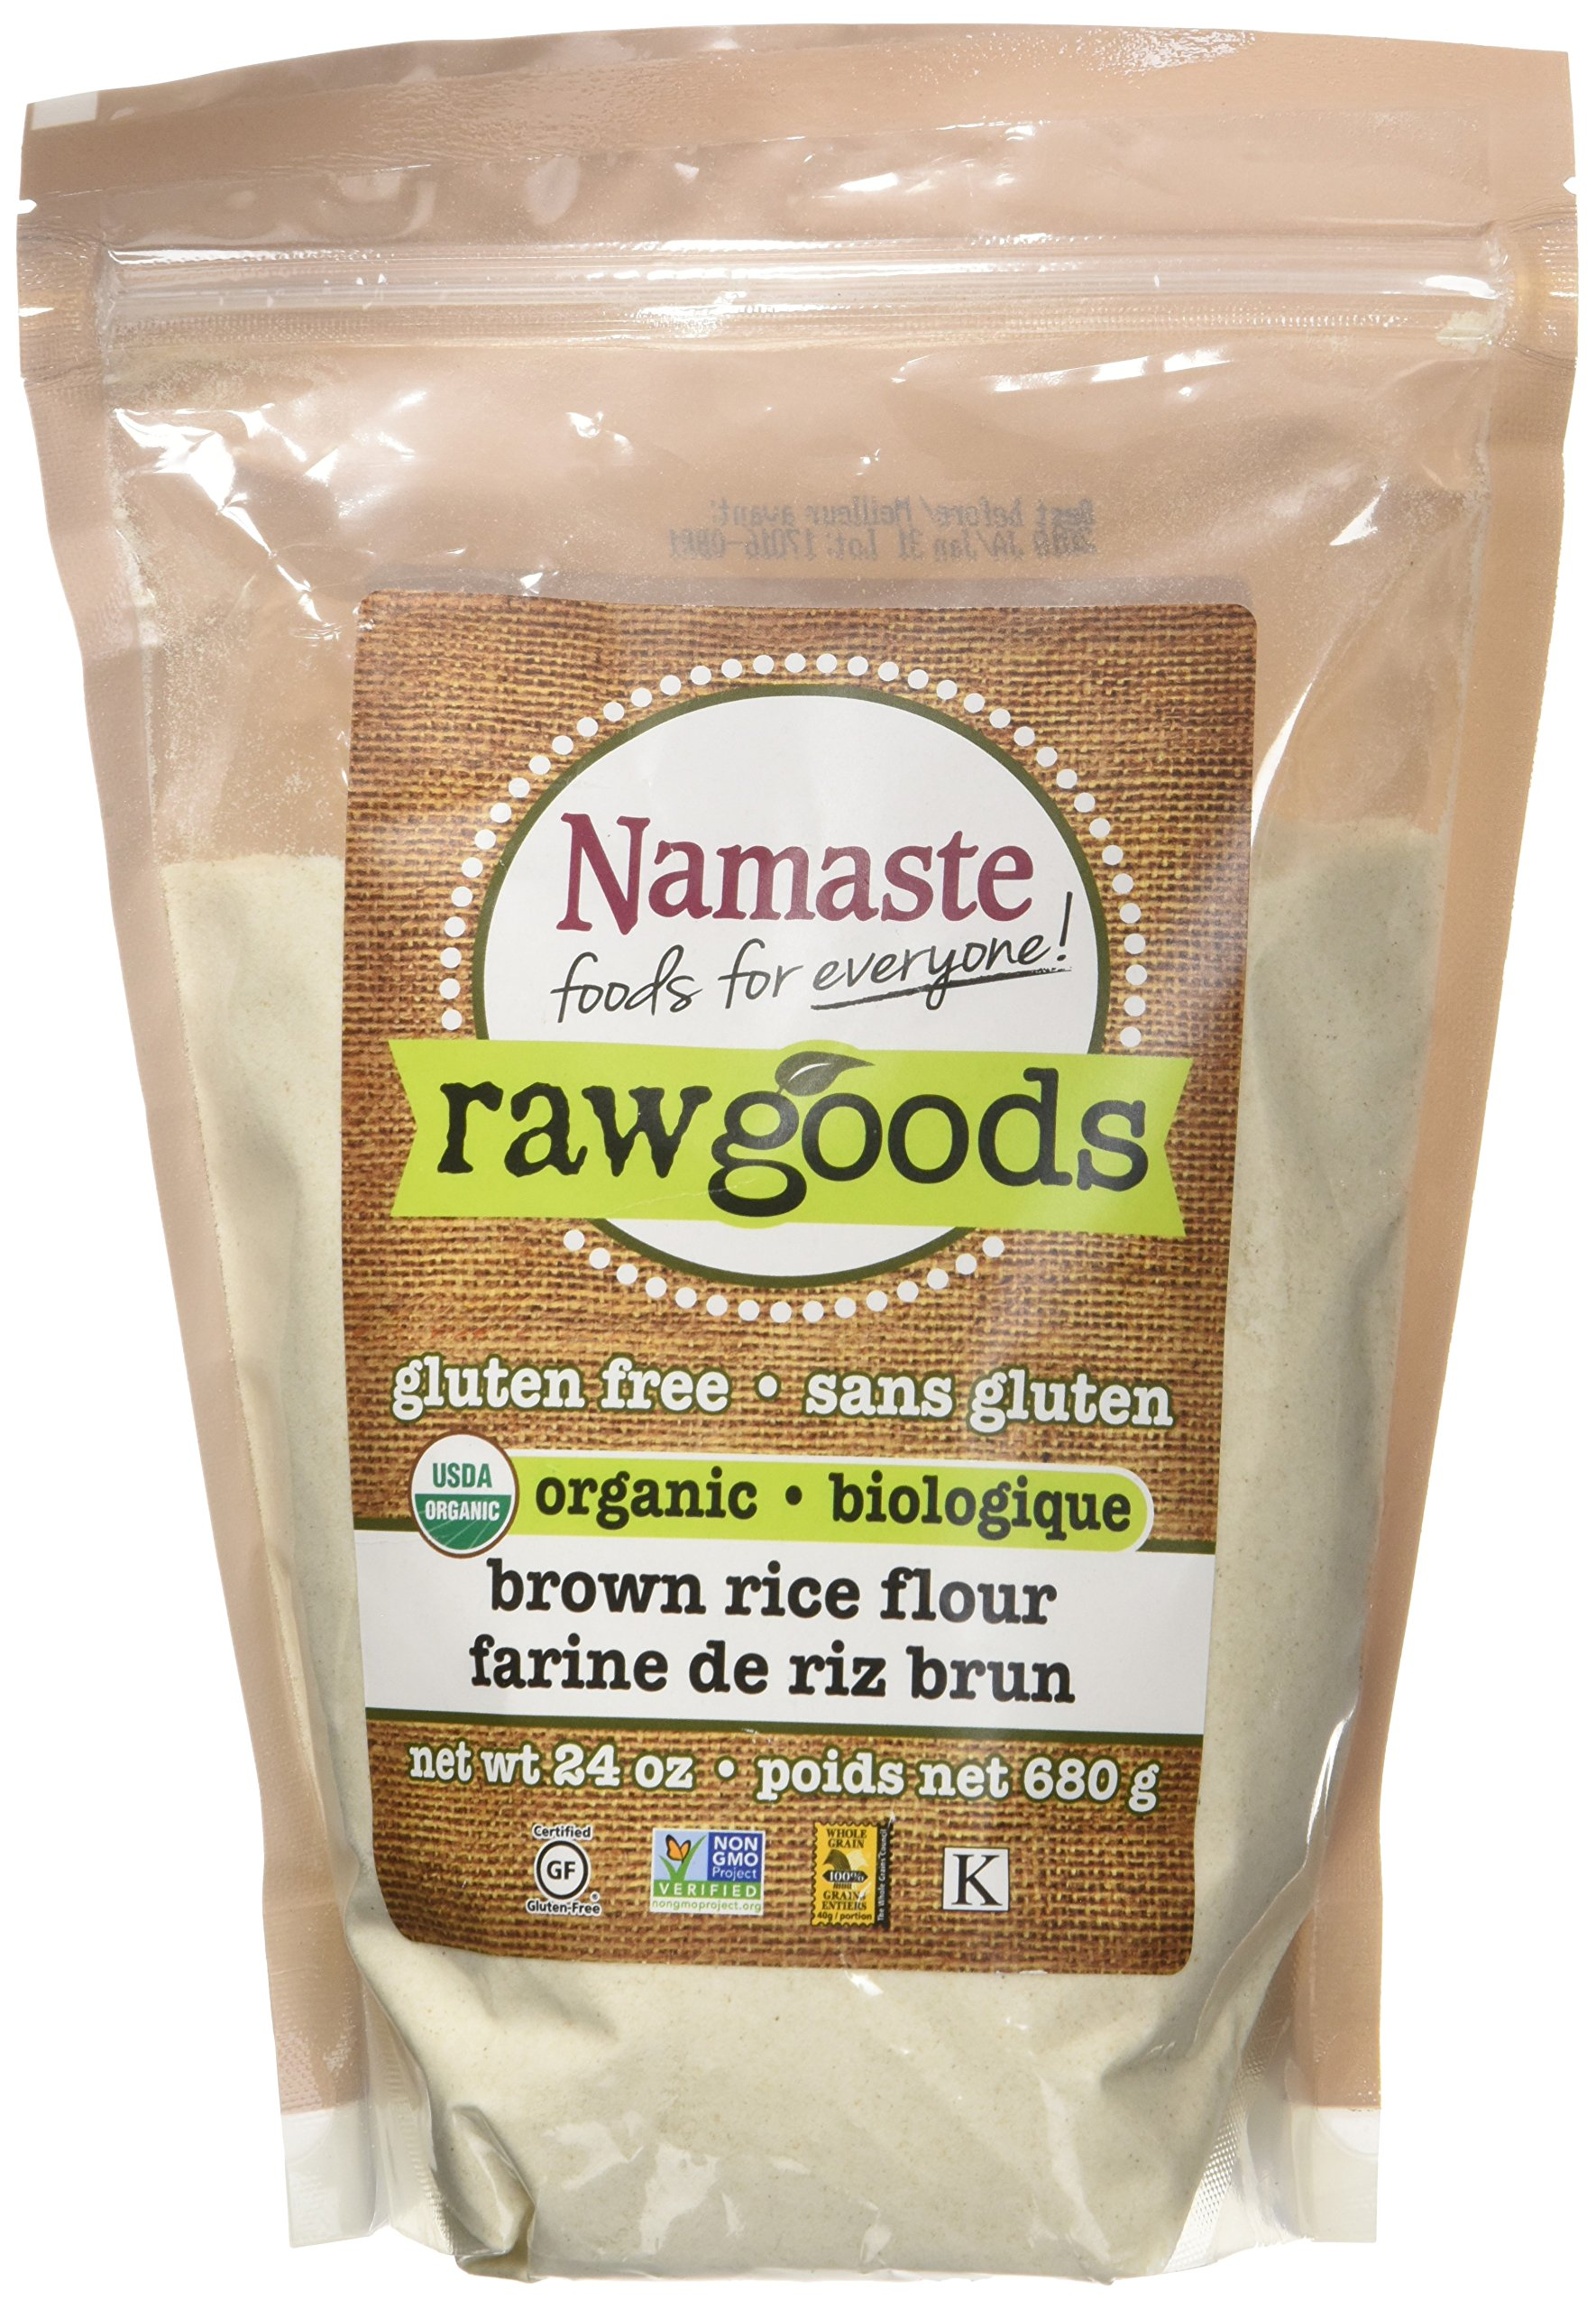 Namaste Foods - Organic Gluten Free Brown Rice Flour - 24 oz.